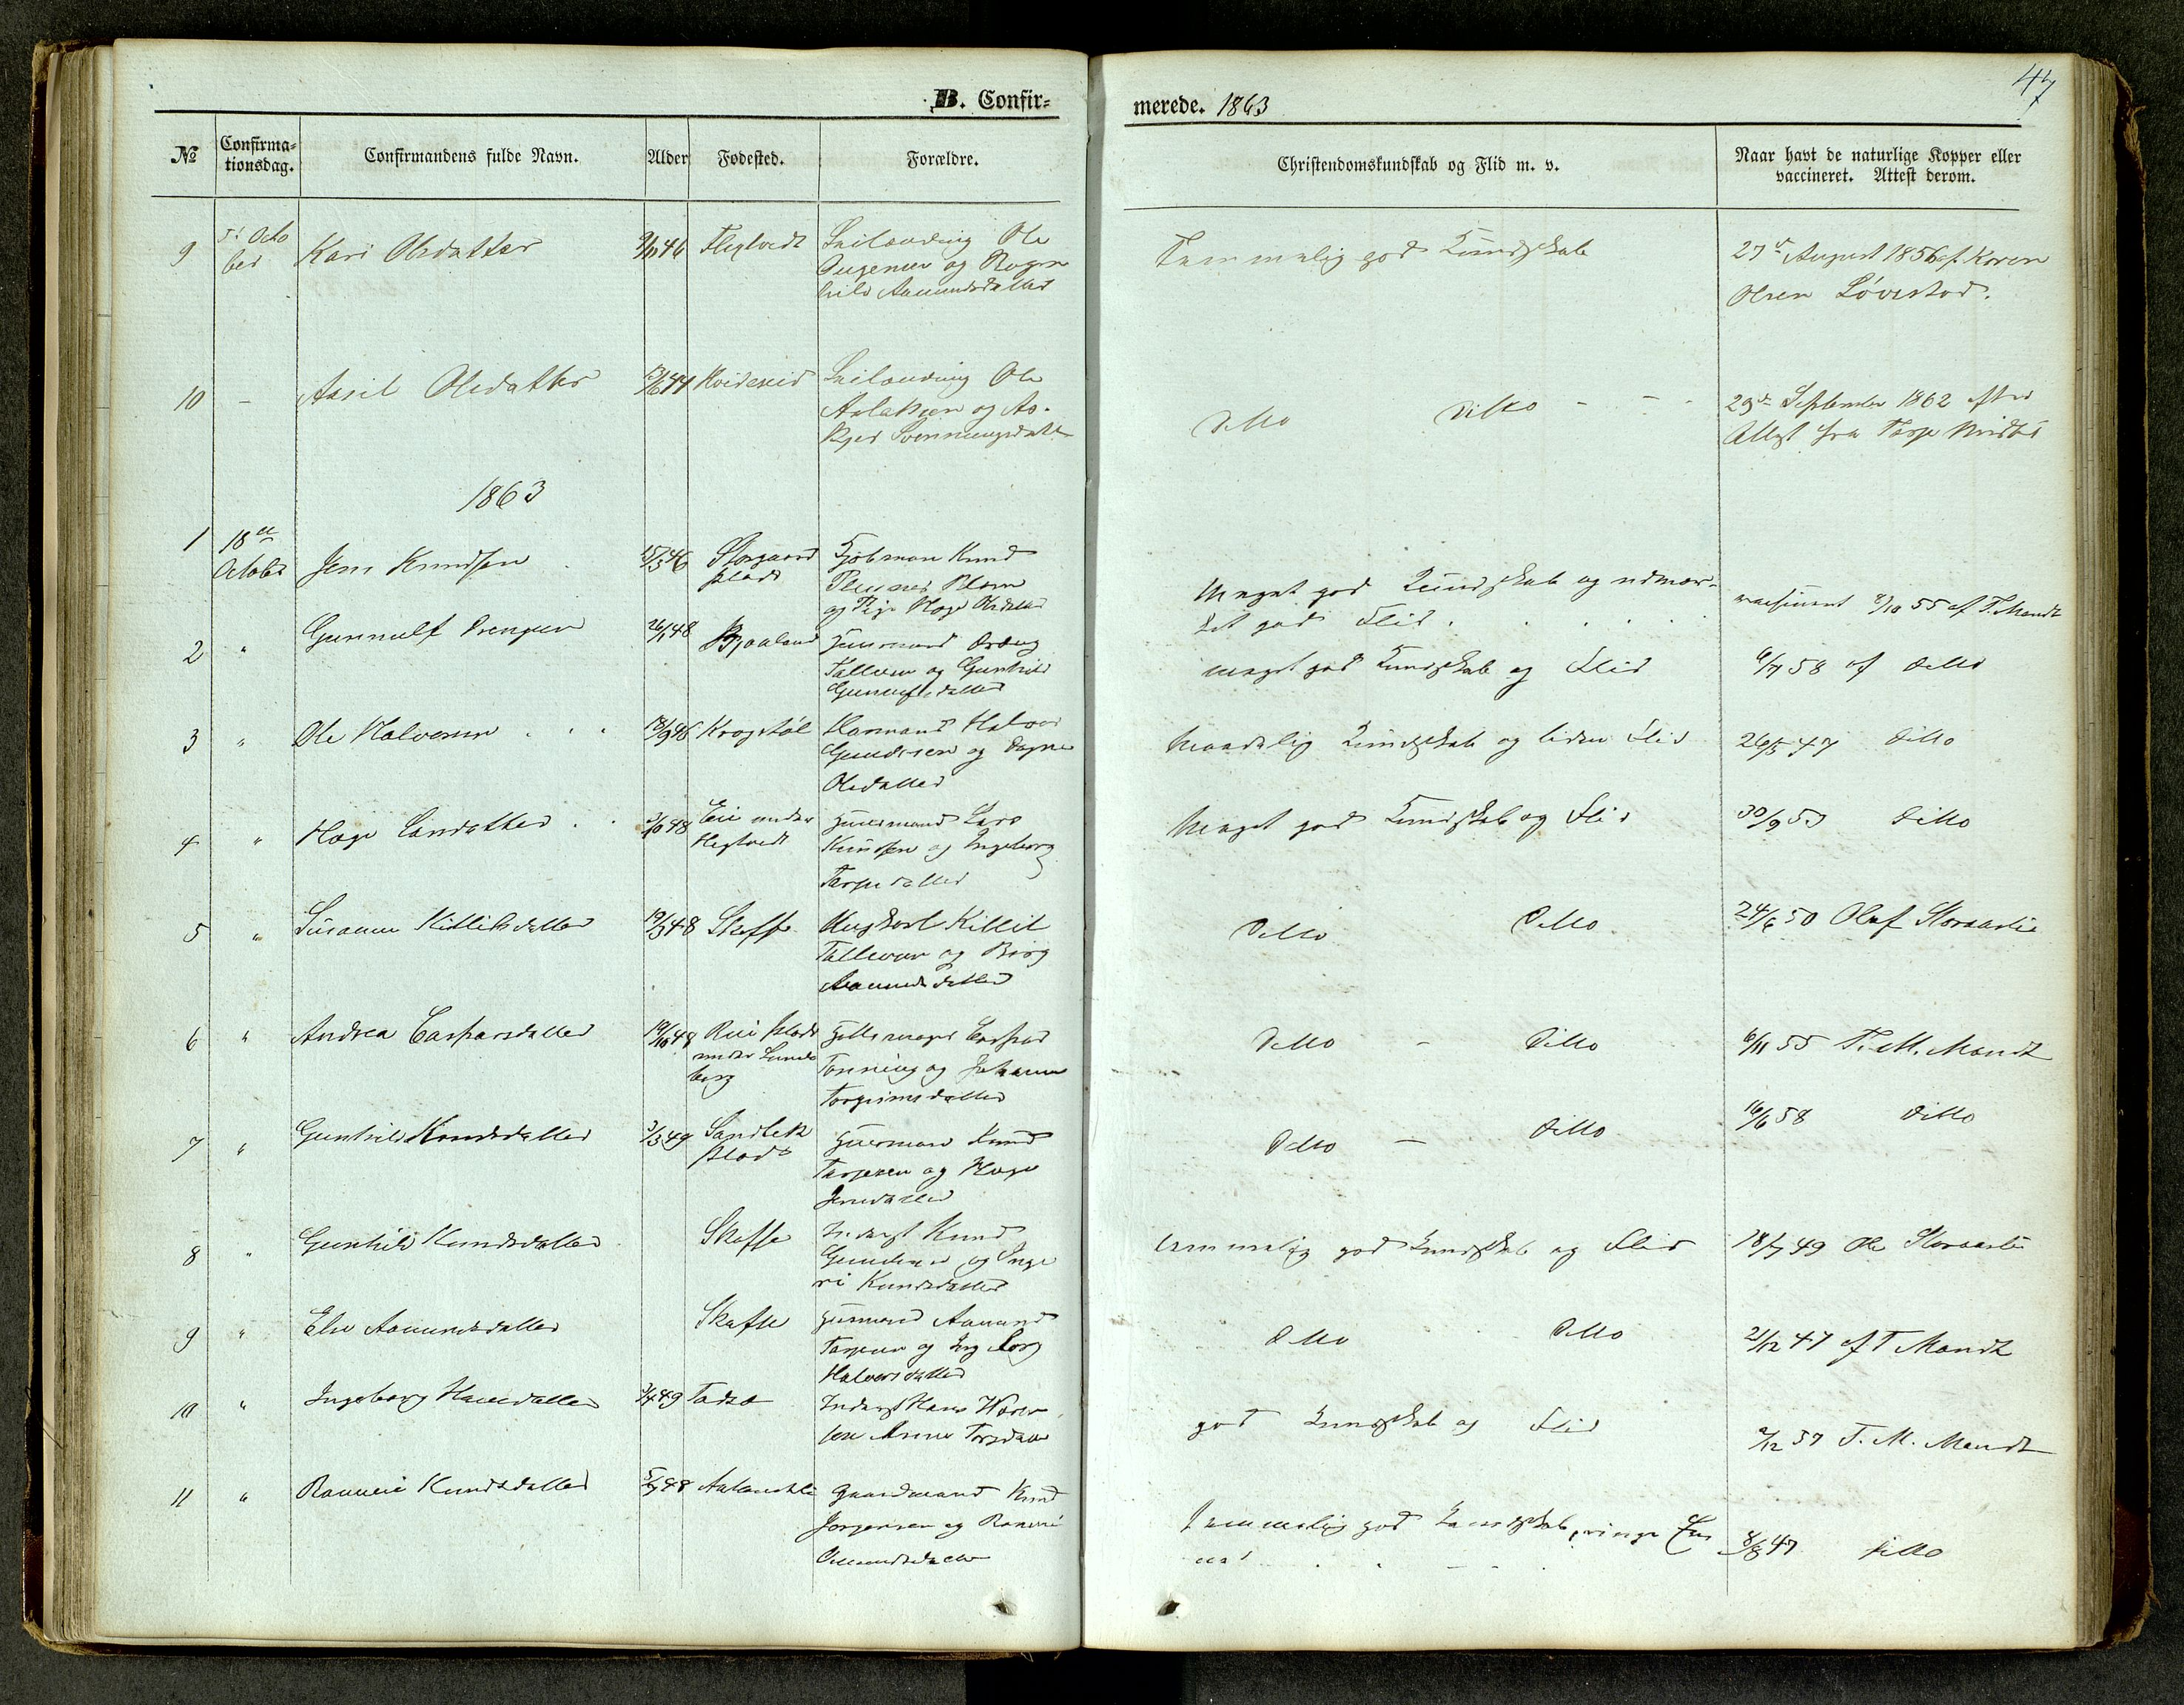 SAKO, Lårdal kirkebøker, G/Ga/L0002: Klokkerbok nr. I 2, 1861-1890, s. 47